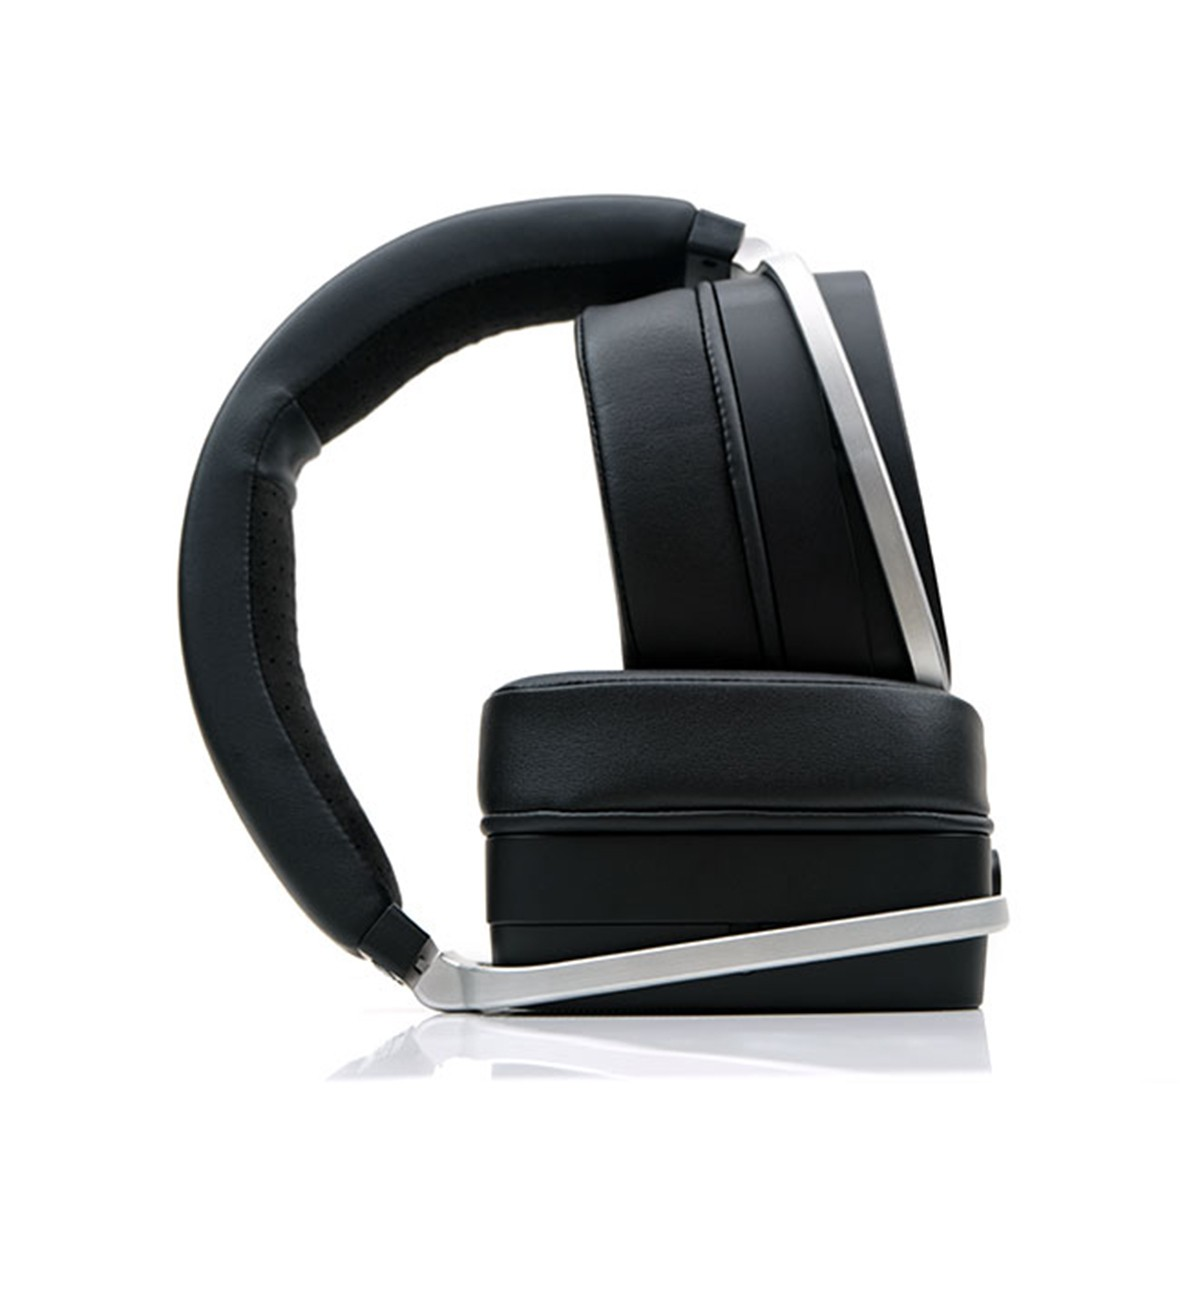 HEADPHONES HEDD HEDDPHONE